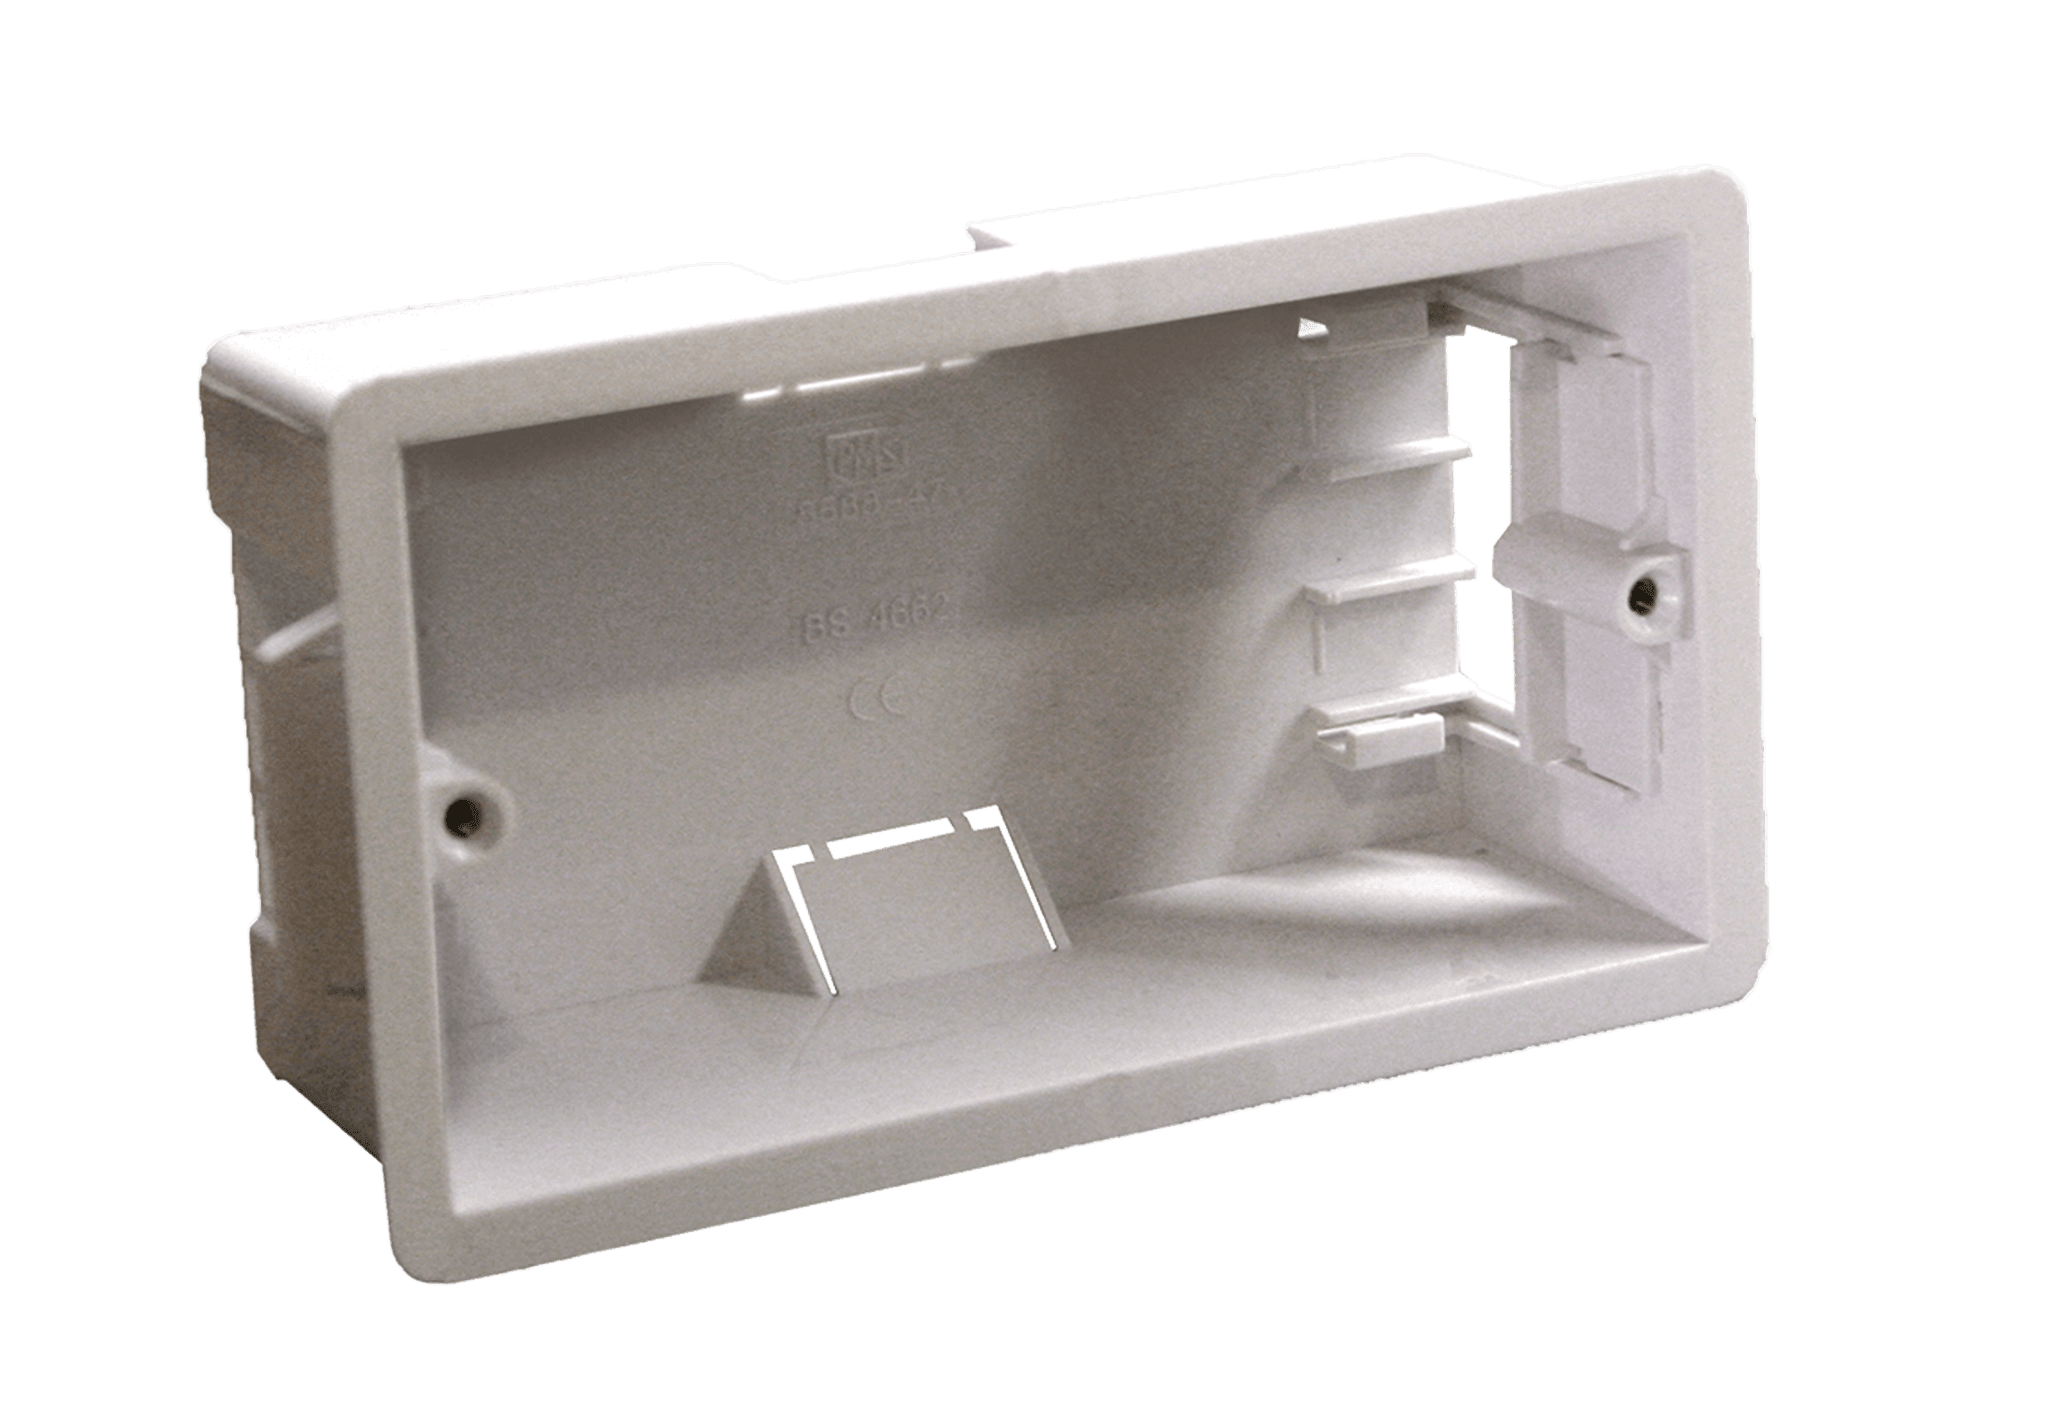 WB50/FG - Flush mount box for AUDAC wallpanel - hollow wall